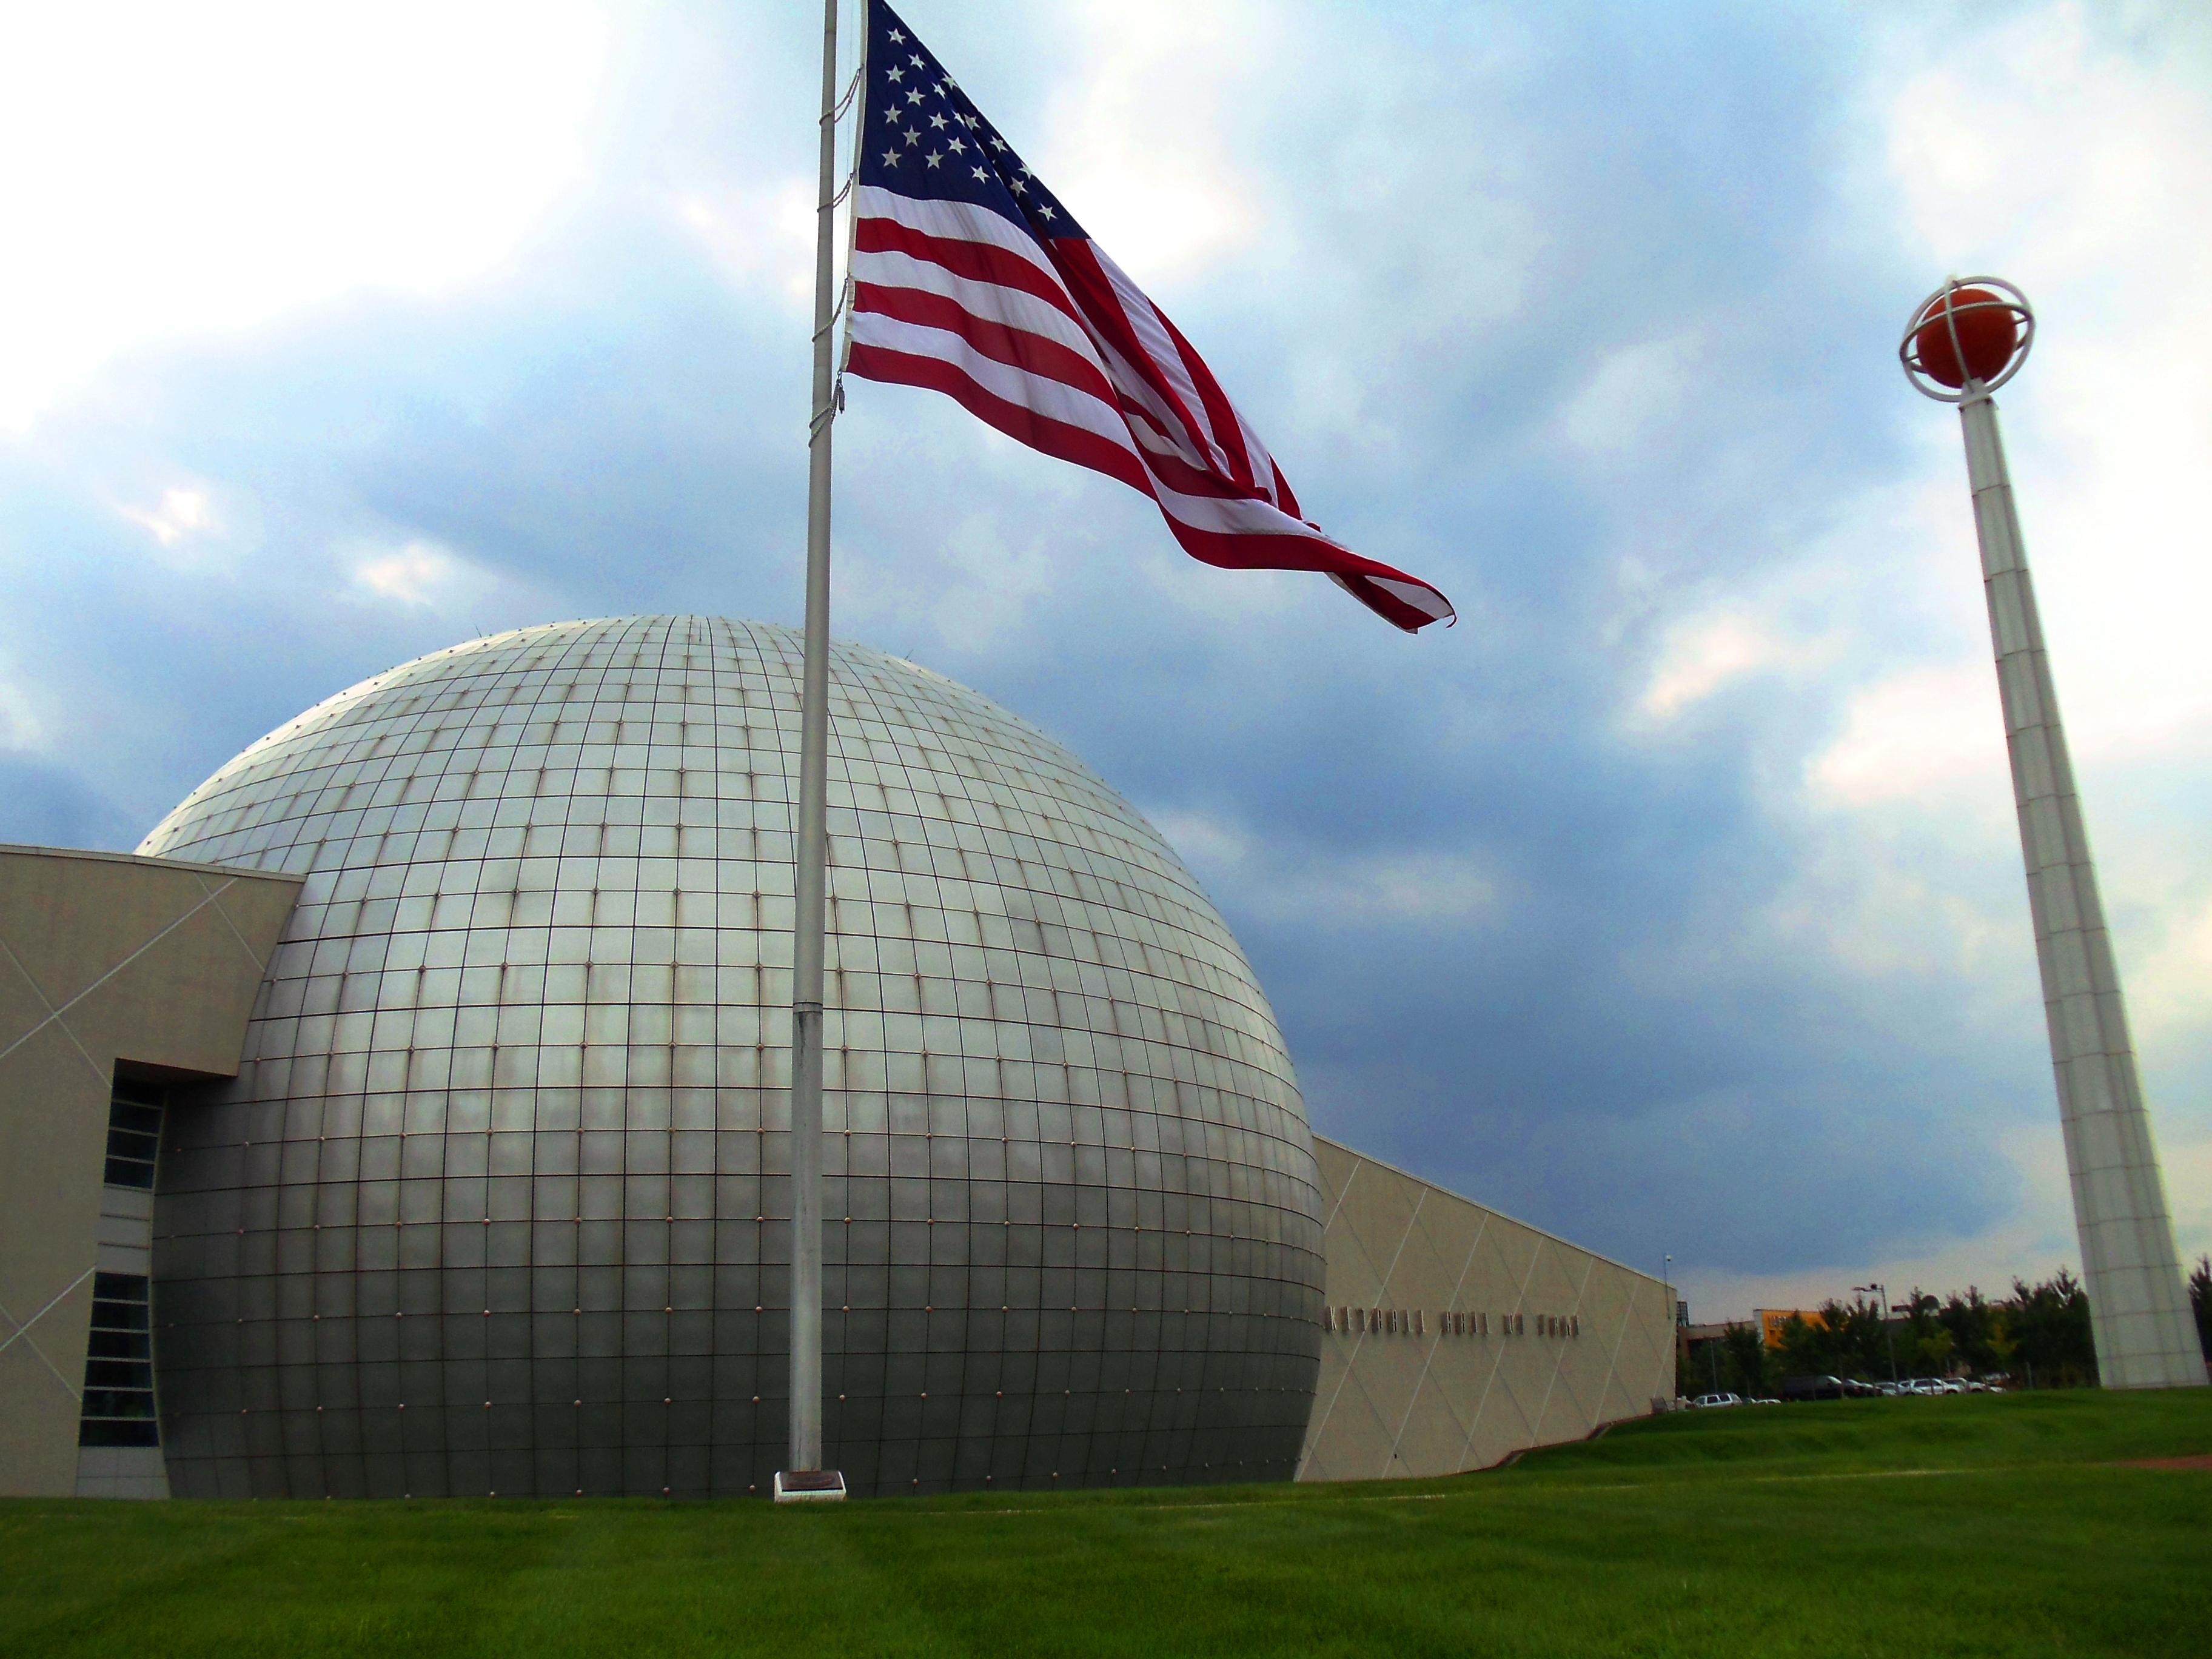 naismith memorial basketball hall of fame - wikipedia